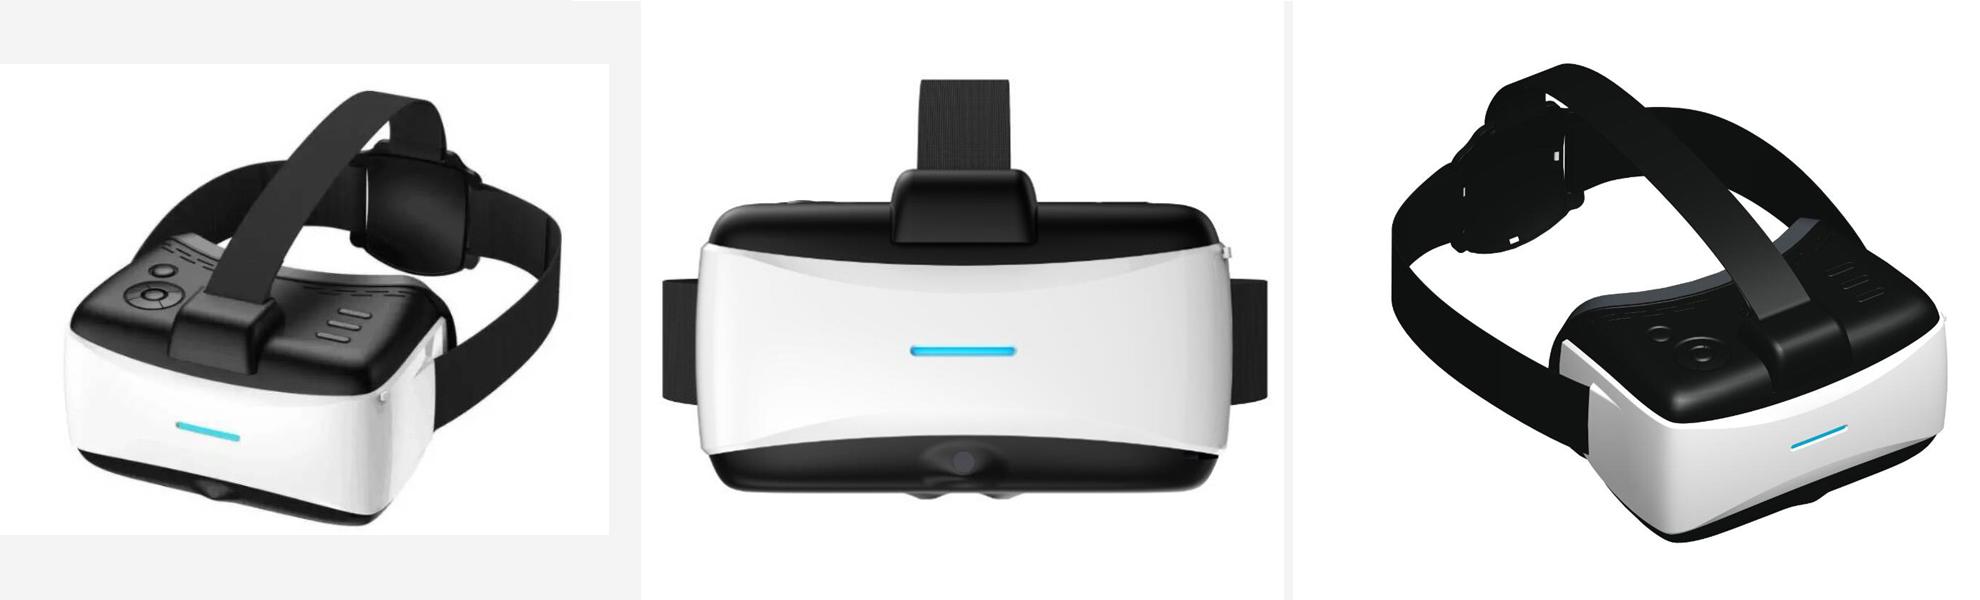 virtual-reality-headset-rentals